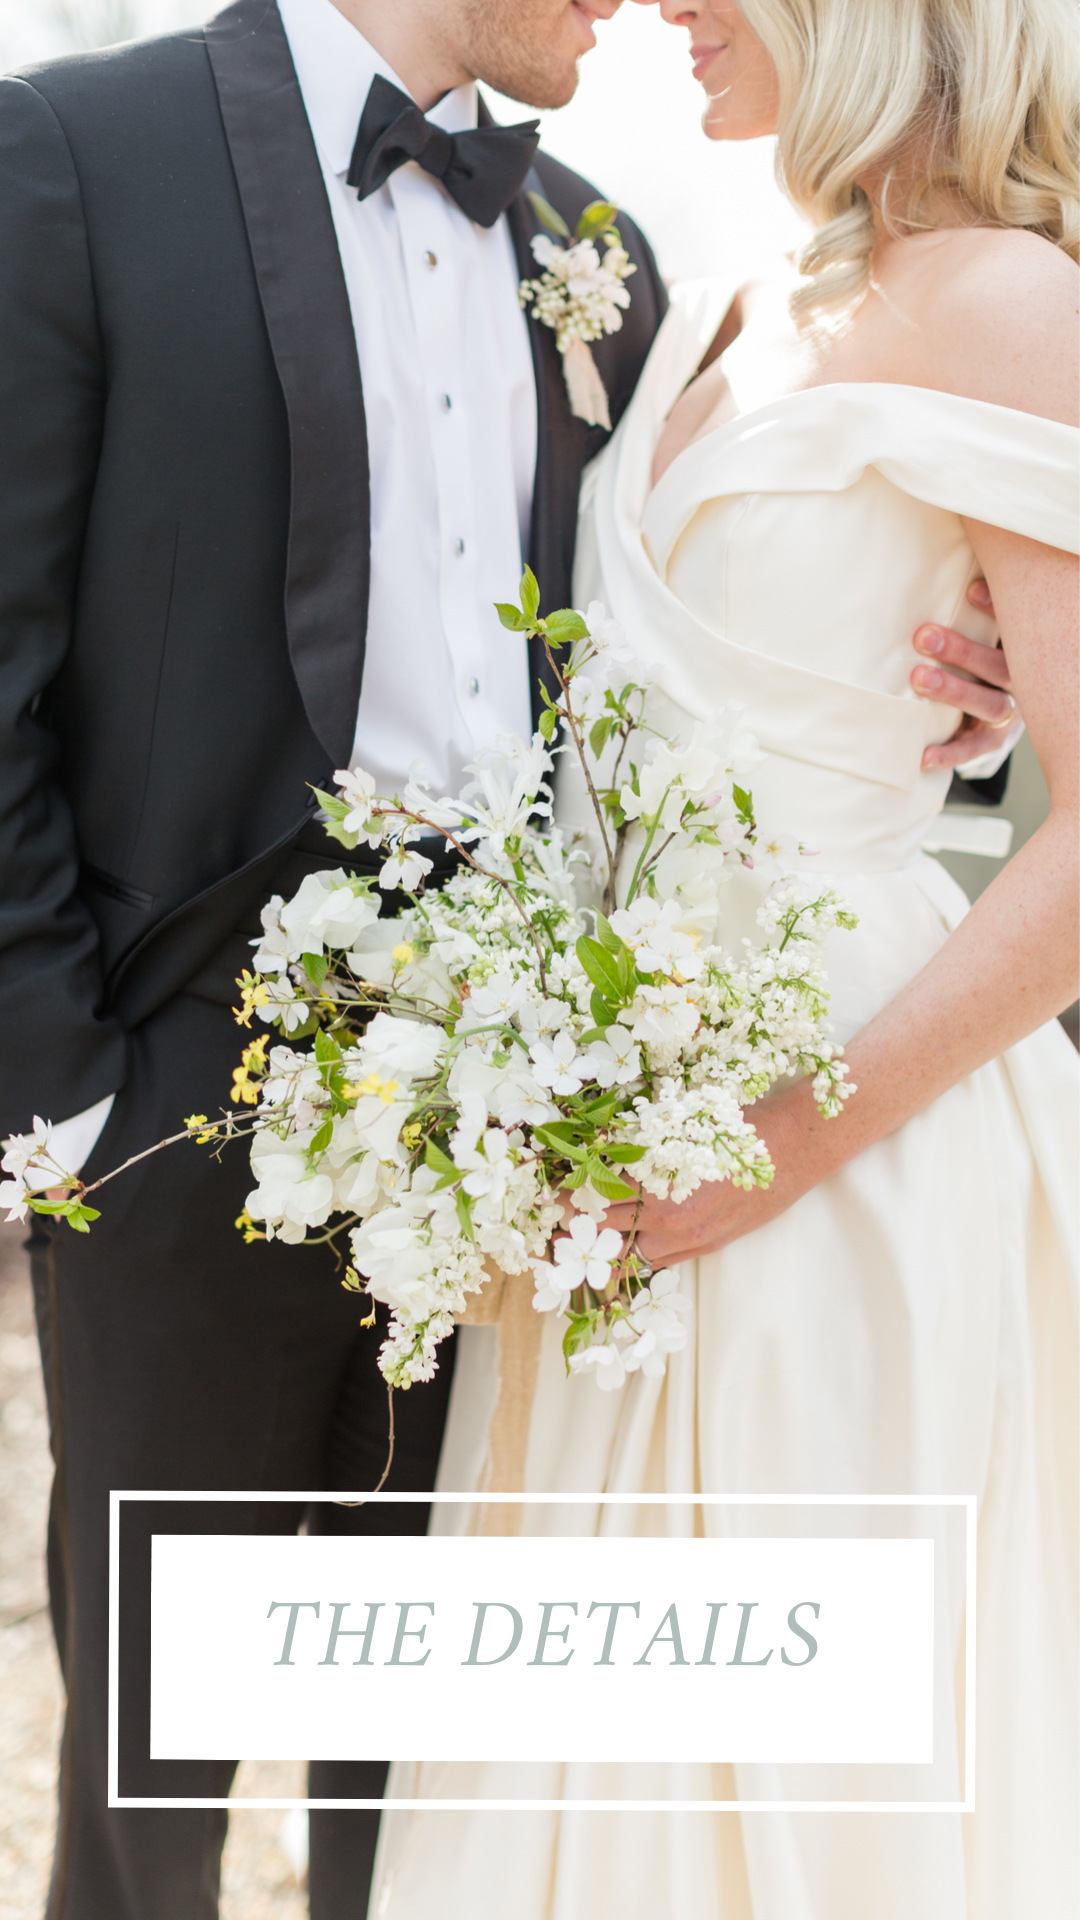 Bespoken Events | Services | Wedding Planning